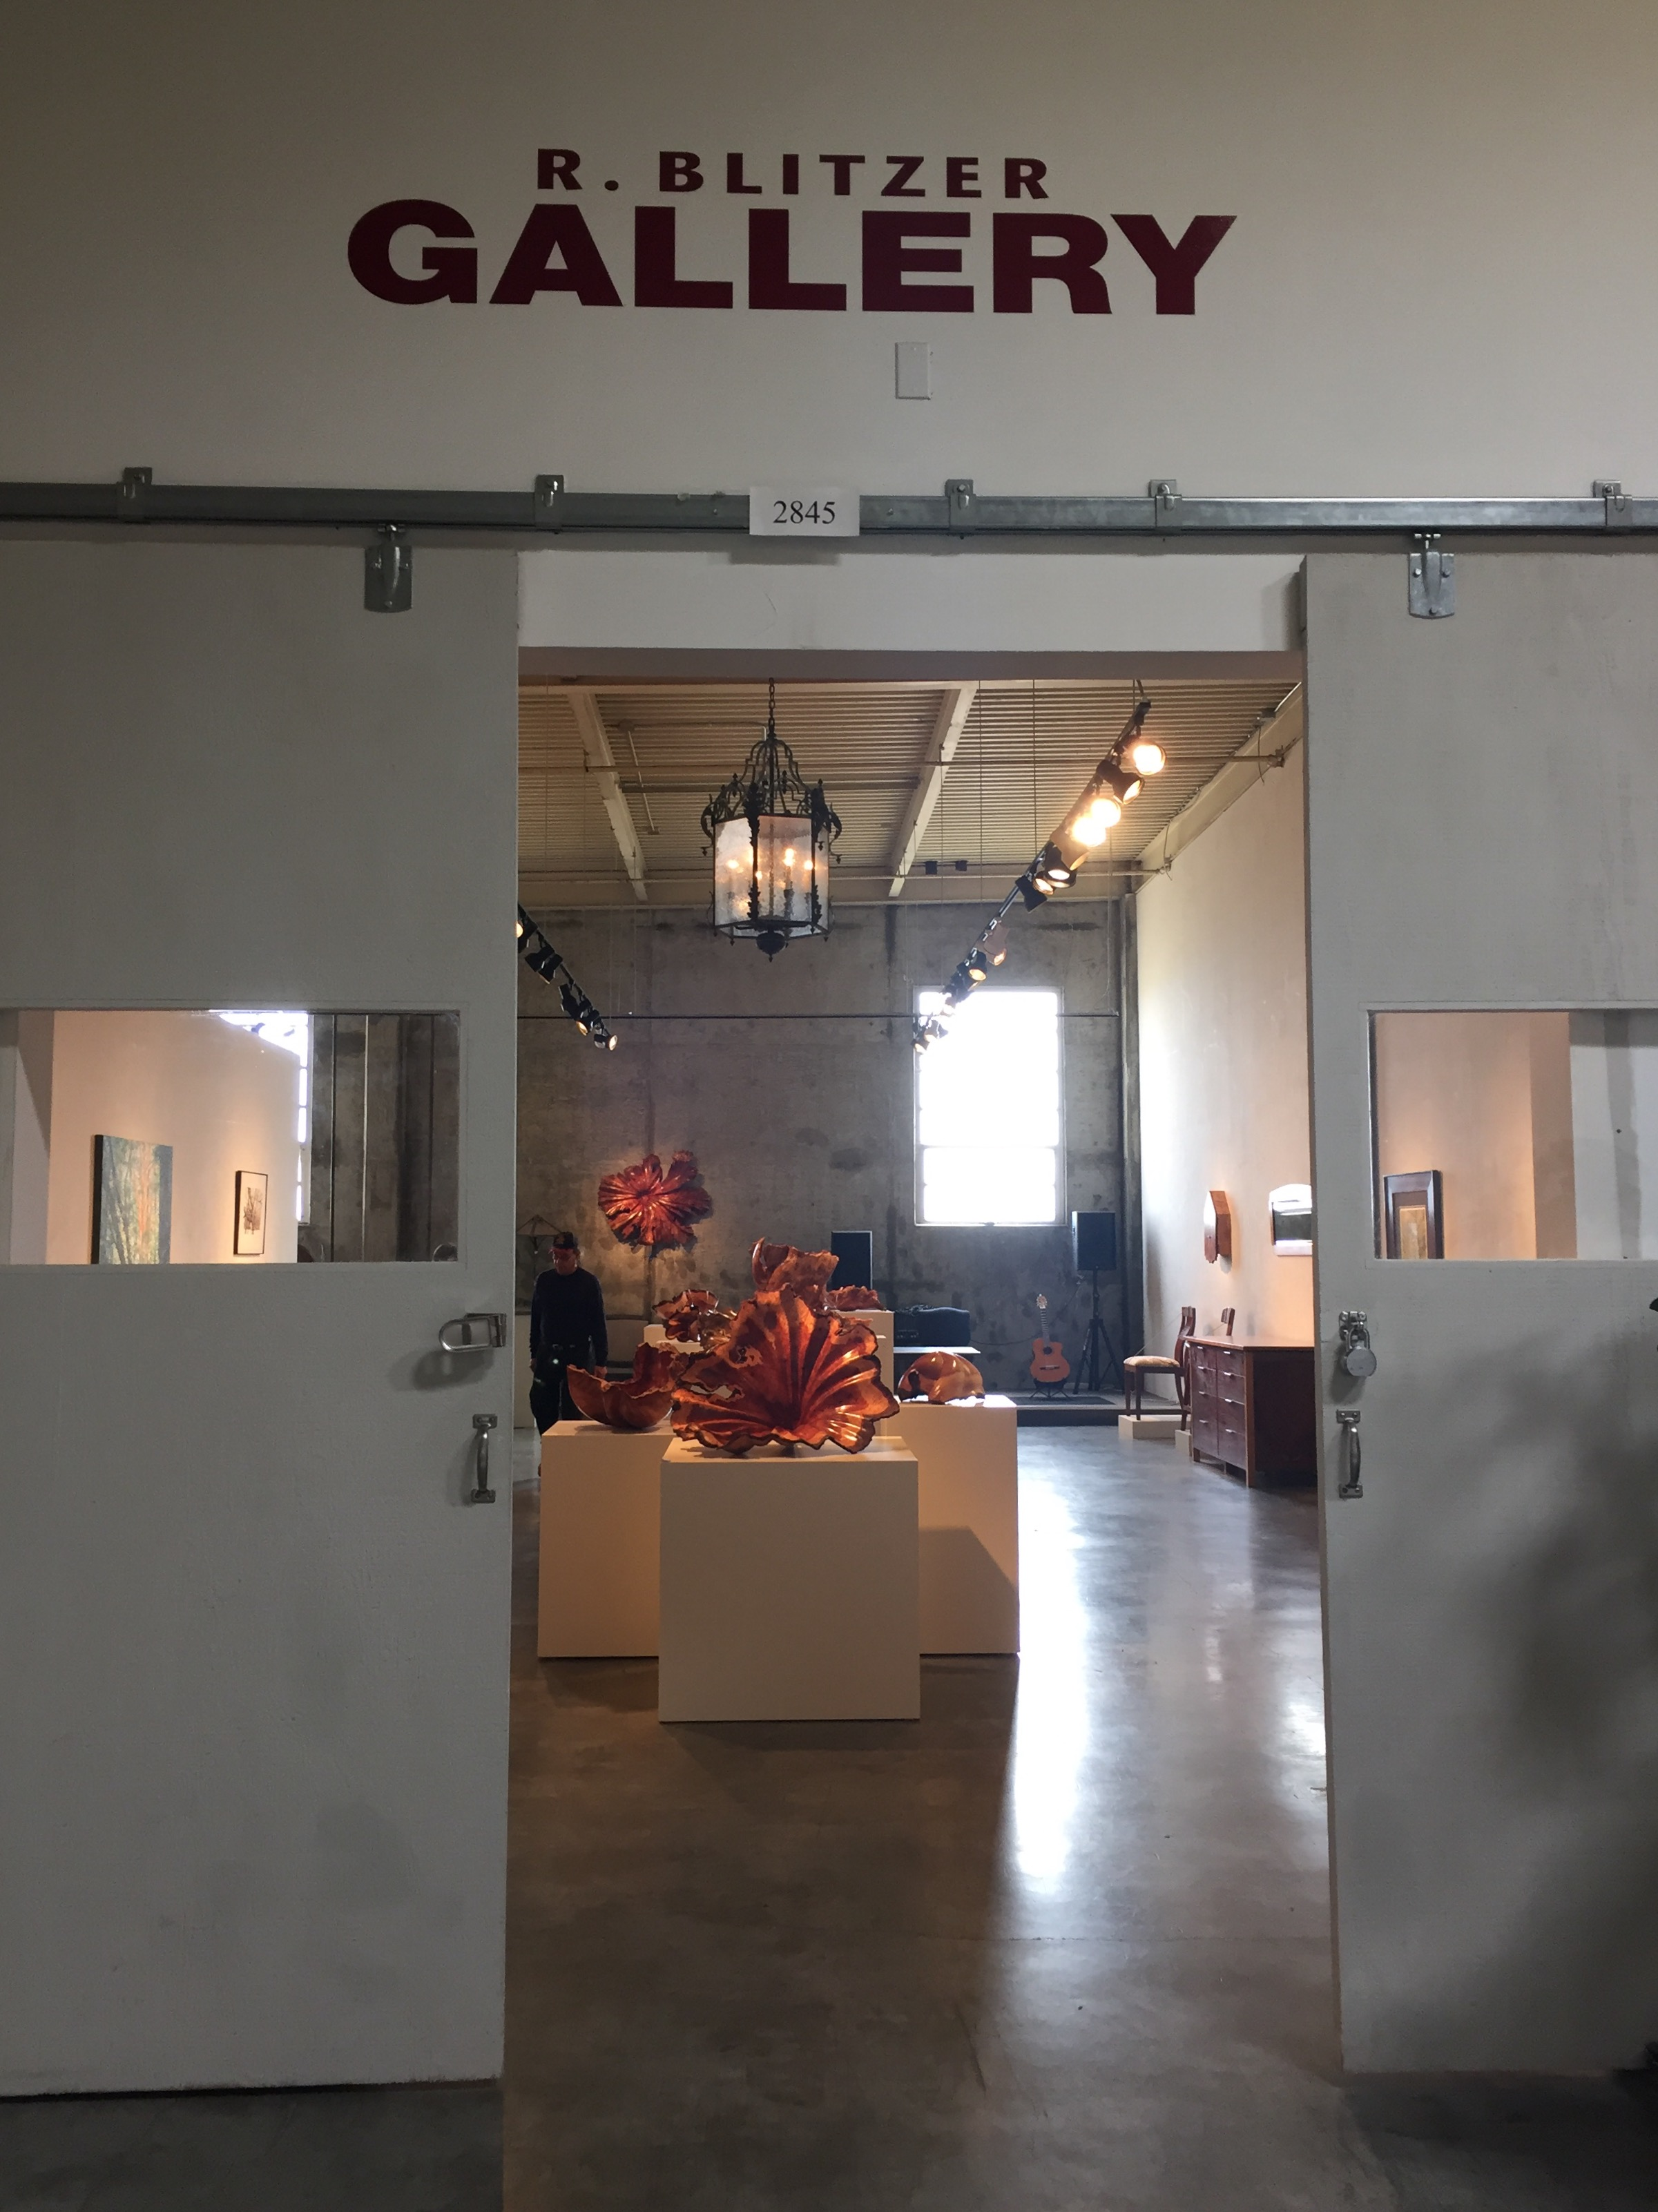 R. Blitzer Gallery